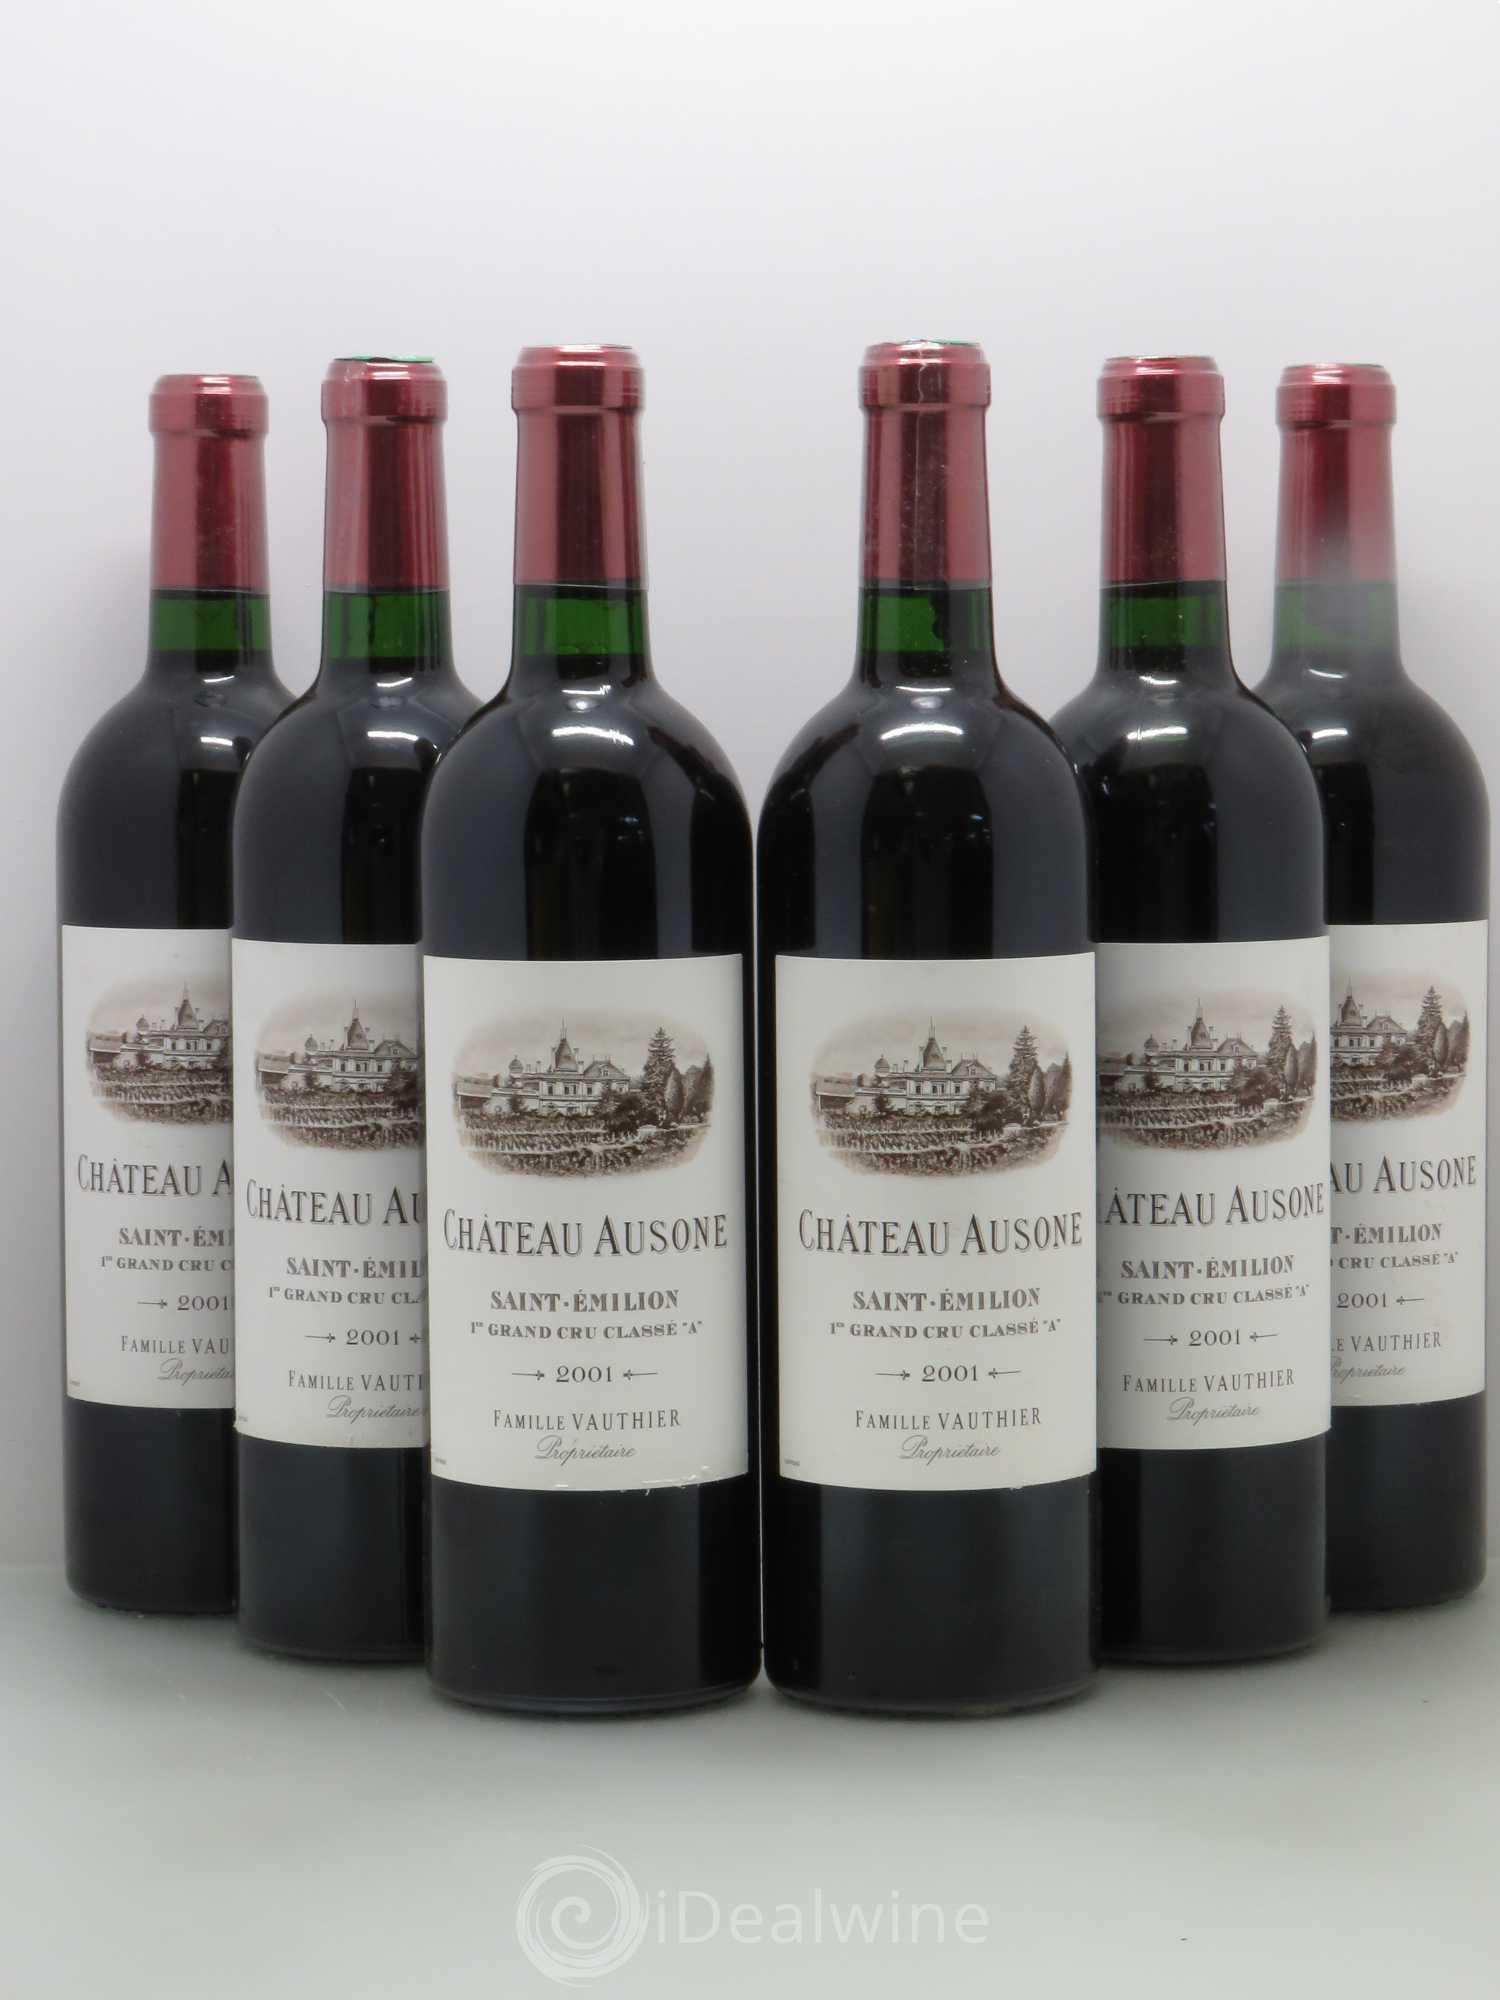 Buy ch teau ausone 1er grand cru class a 2001 lot 11501 for Buy chateaubriand